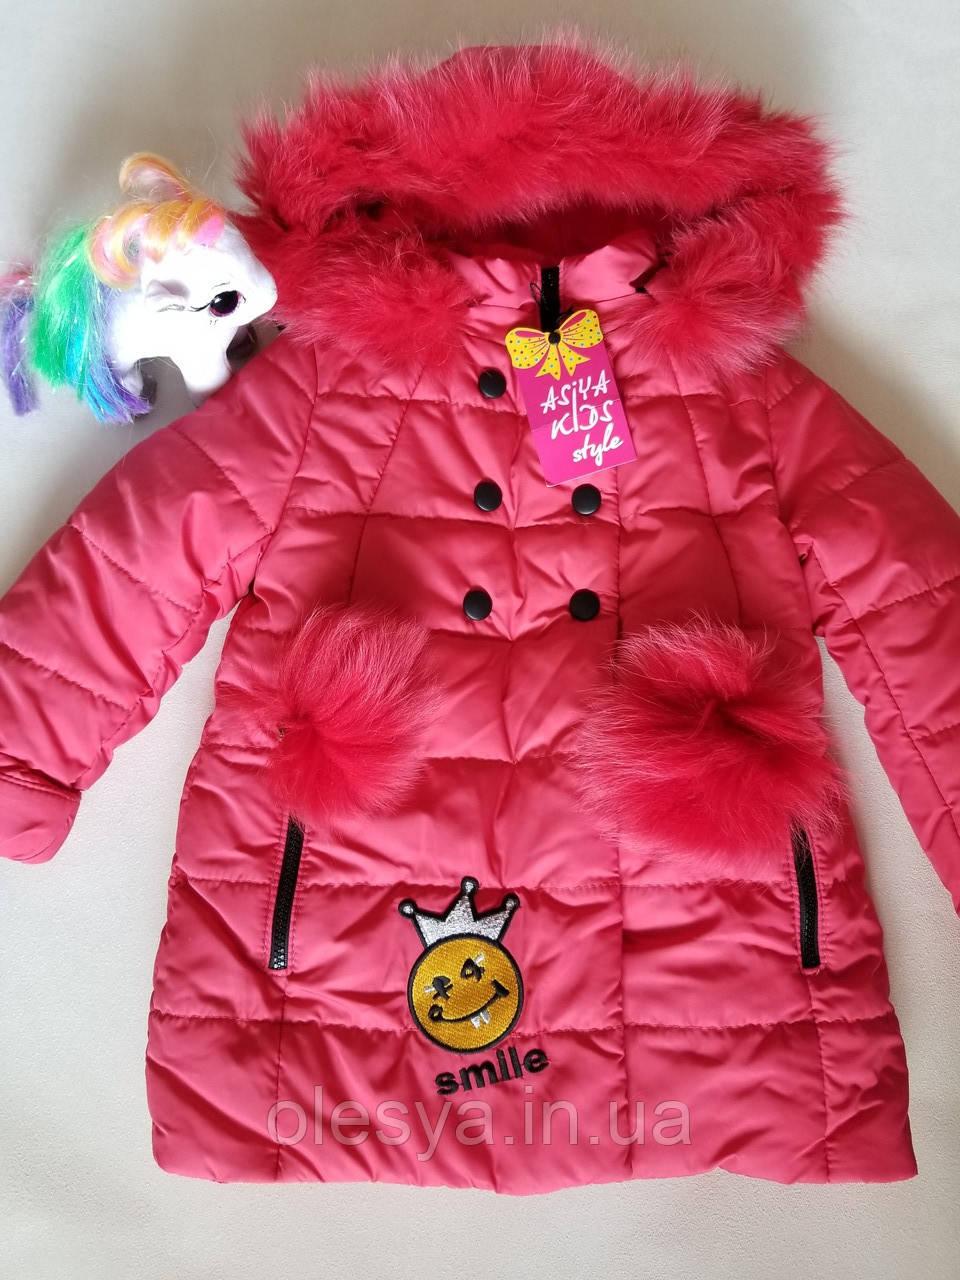 Детский зимний пуховик на девочку Смайл Размер 28